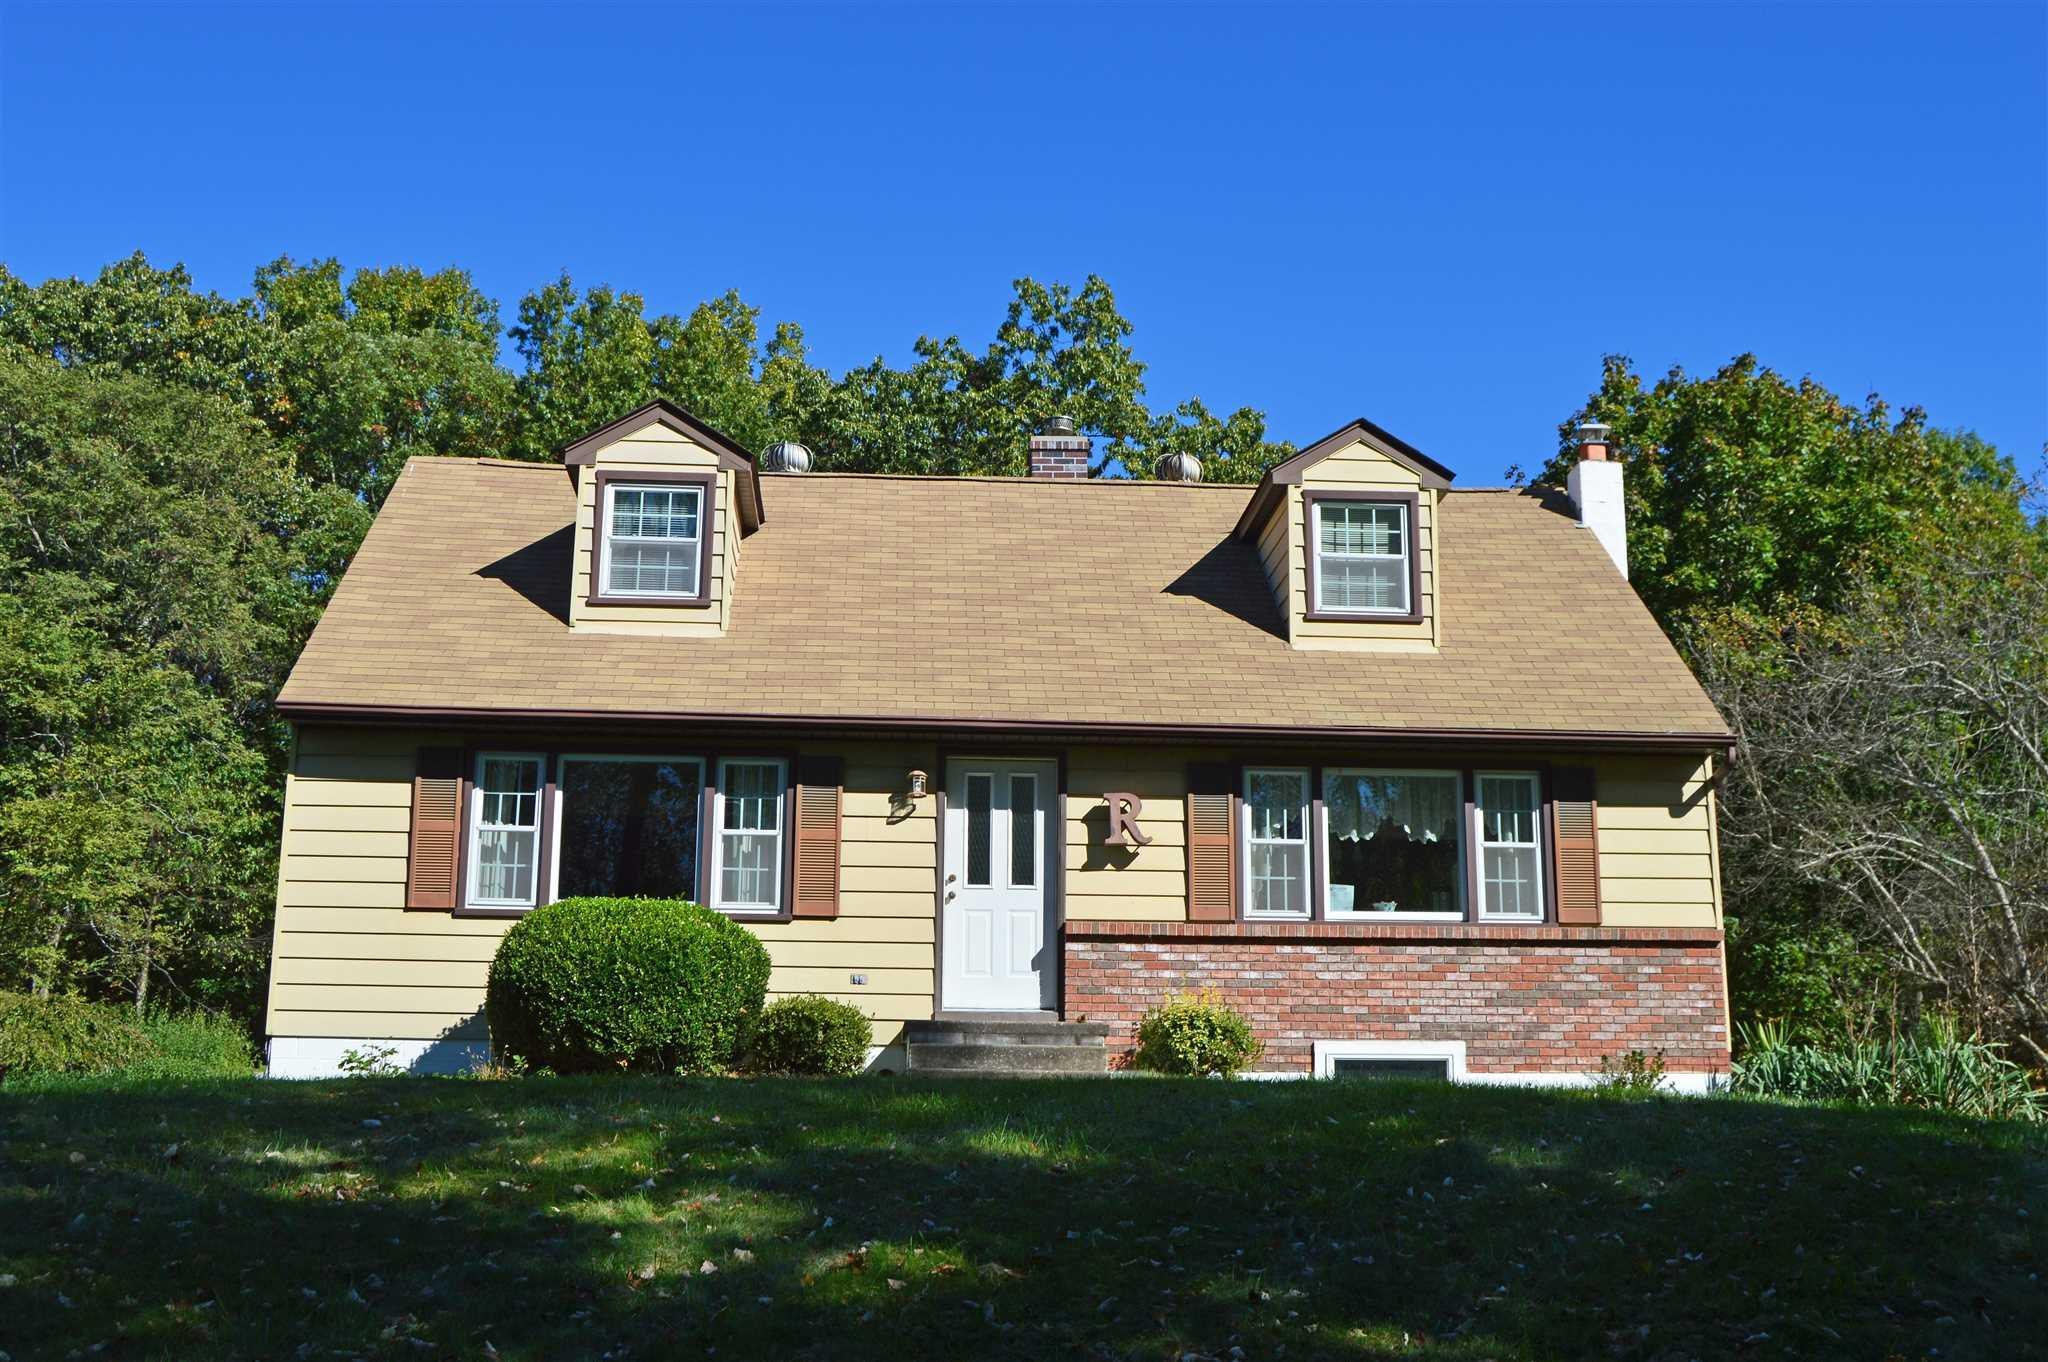 Single Family Home for Sale at 113 VICKI LANE 113 VICKI LANE East Fishkill, New York 12533 United States